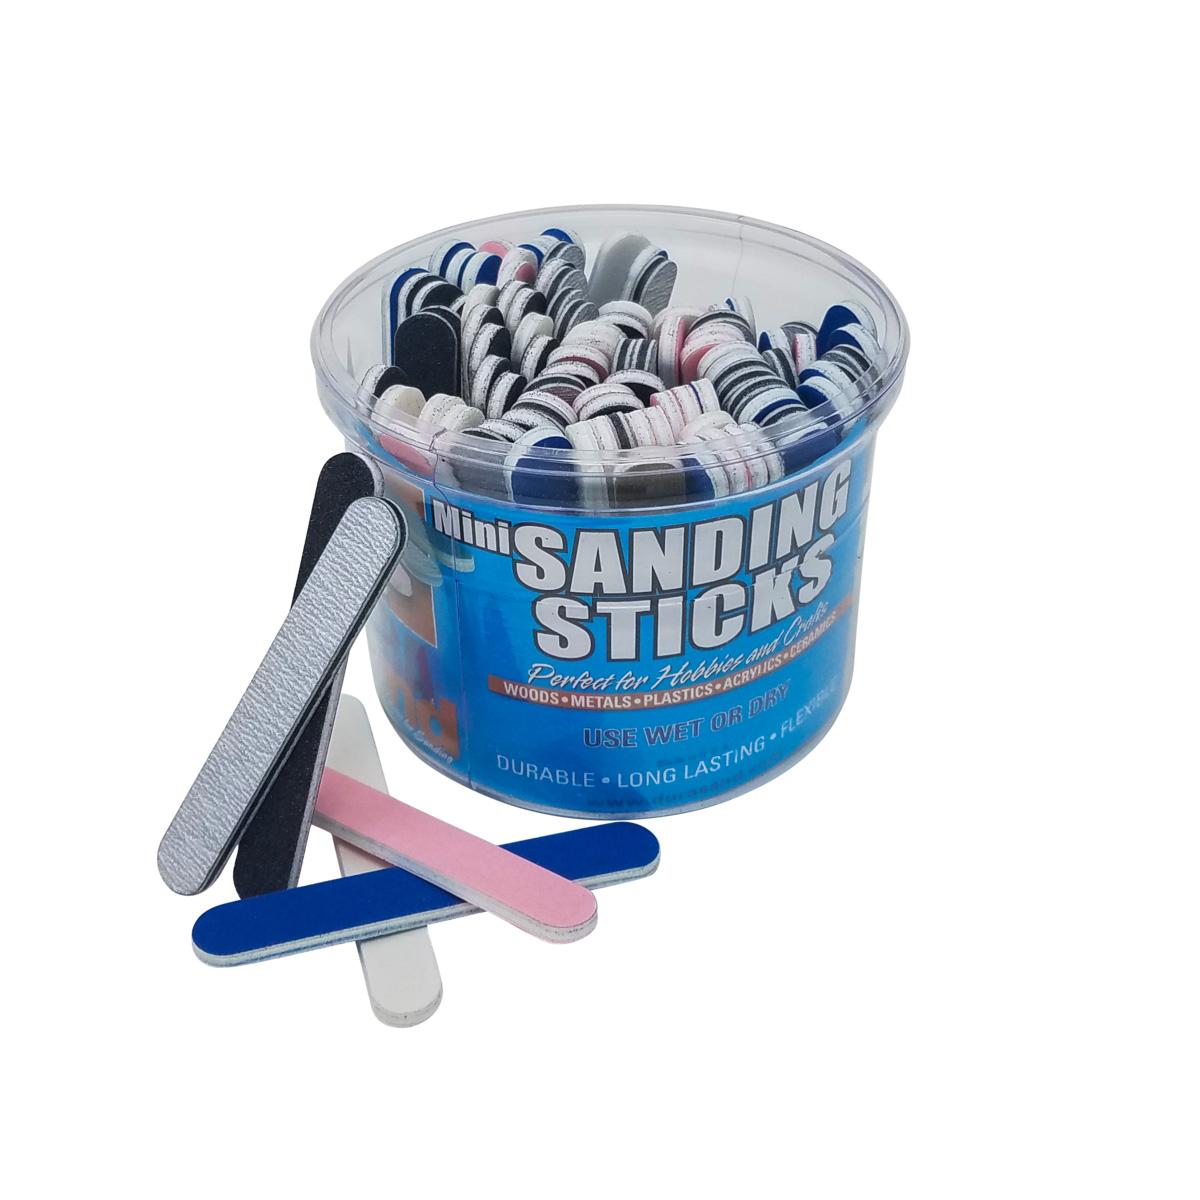 Mini Sanding Sticks, 100 Piece Bucket, Assorted Grits &